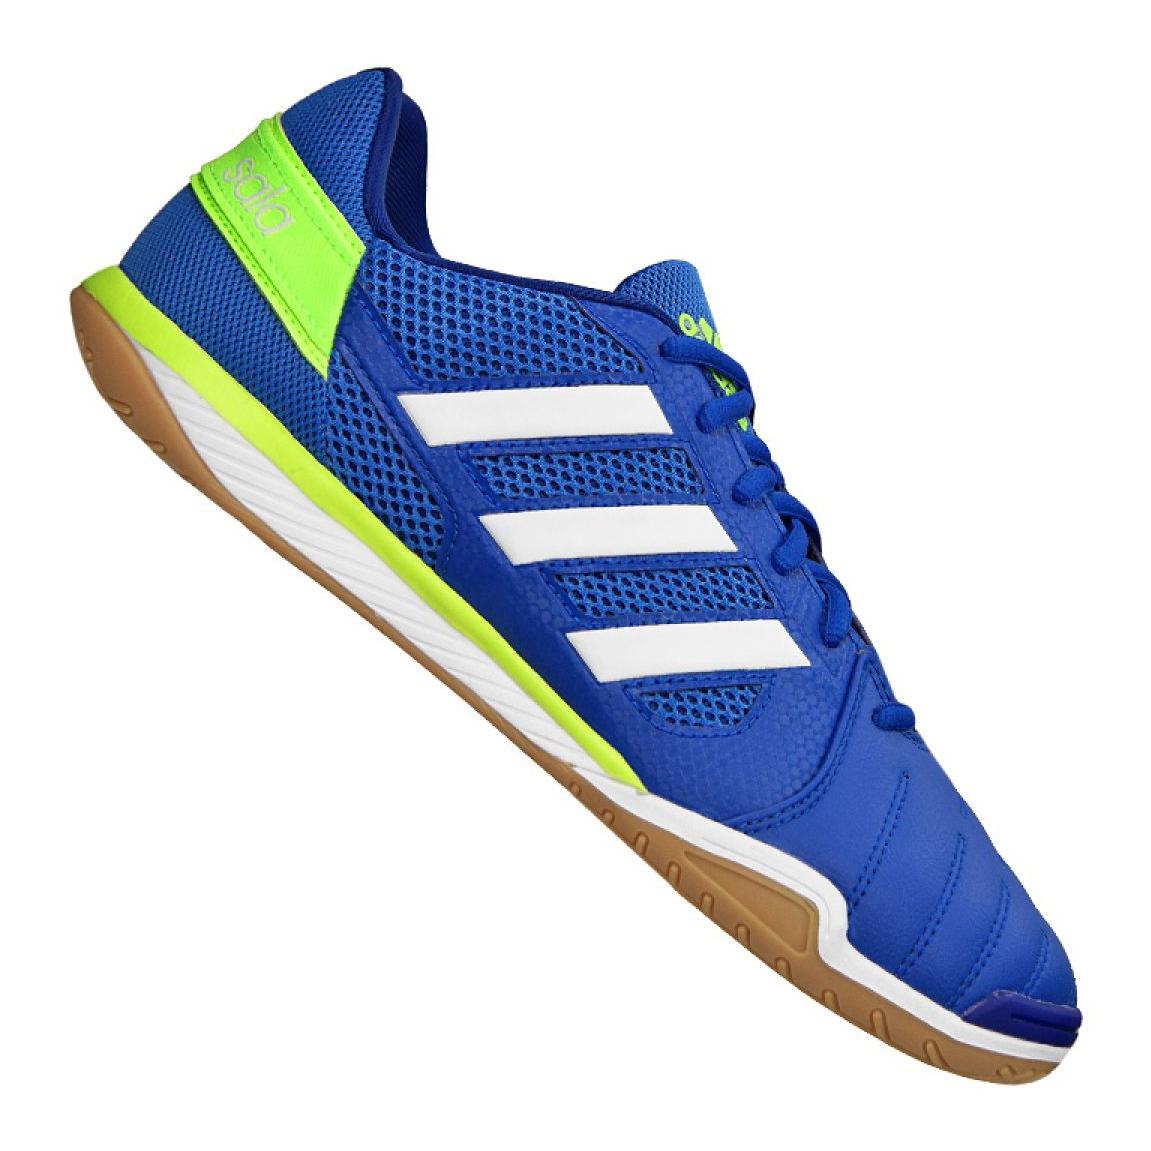 Adidas Top Sala M FV2551 shoes blue